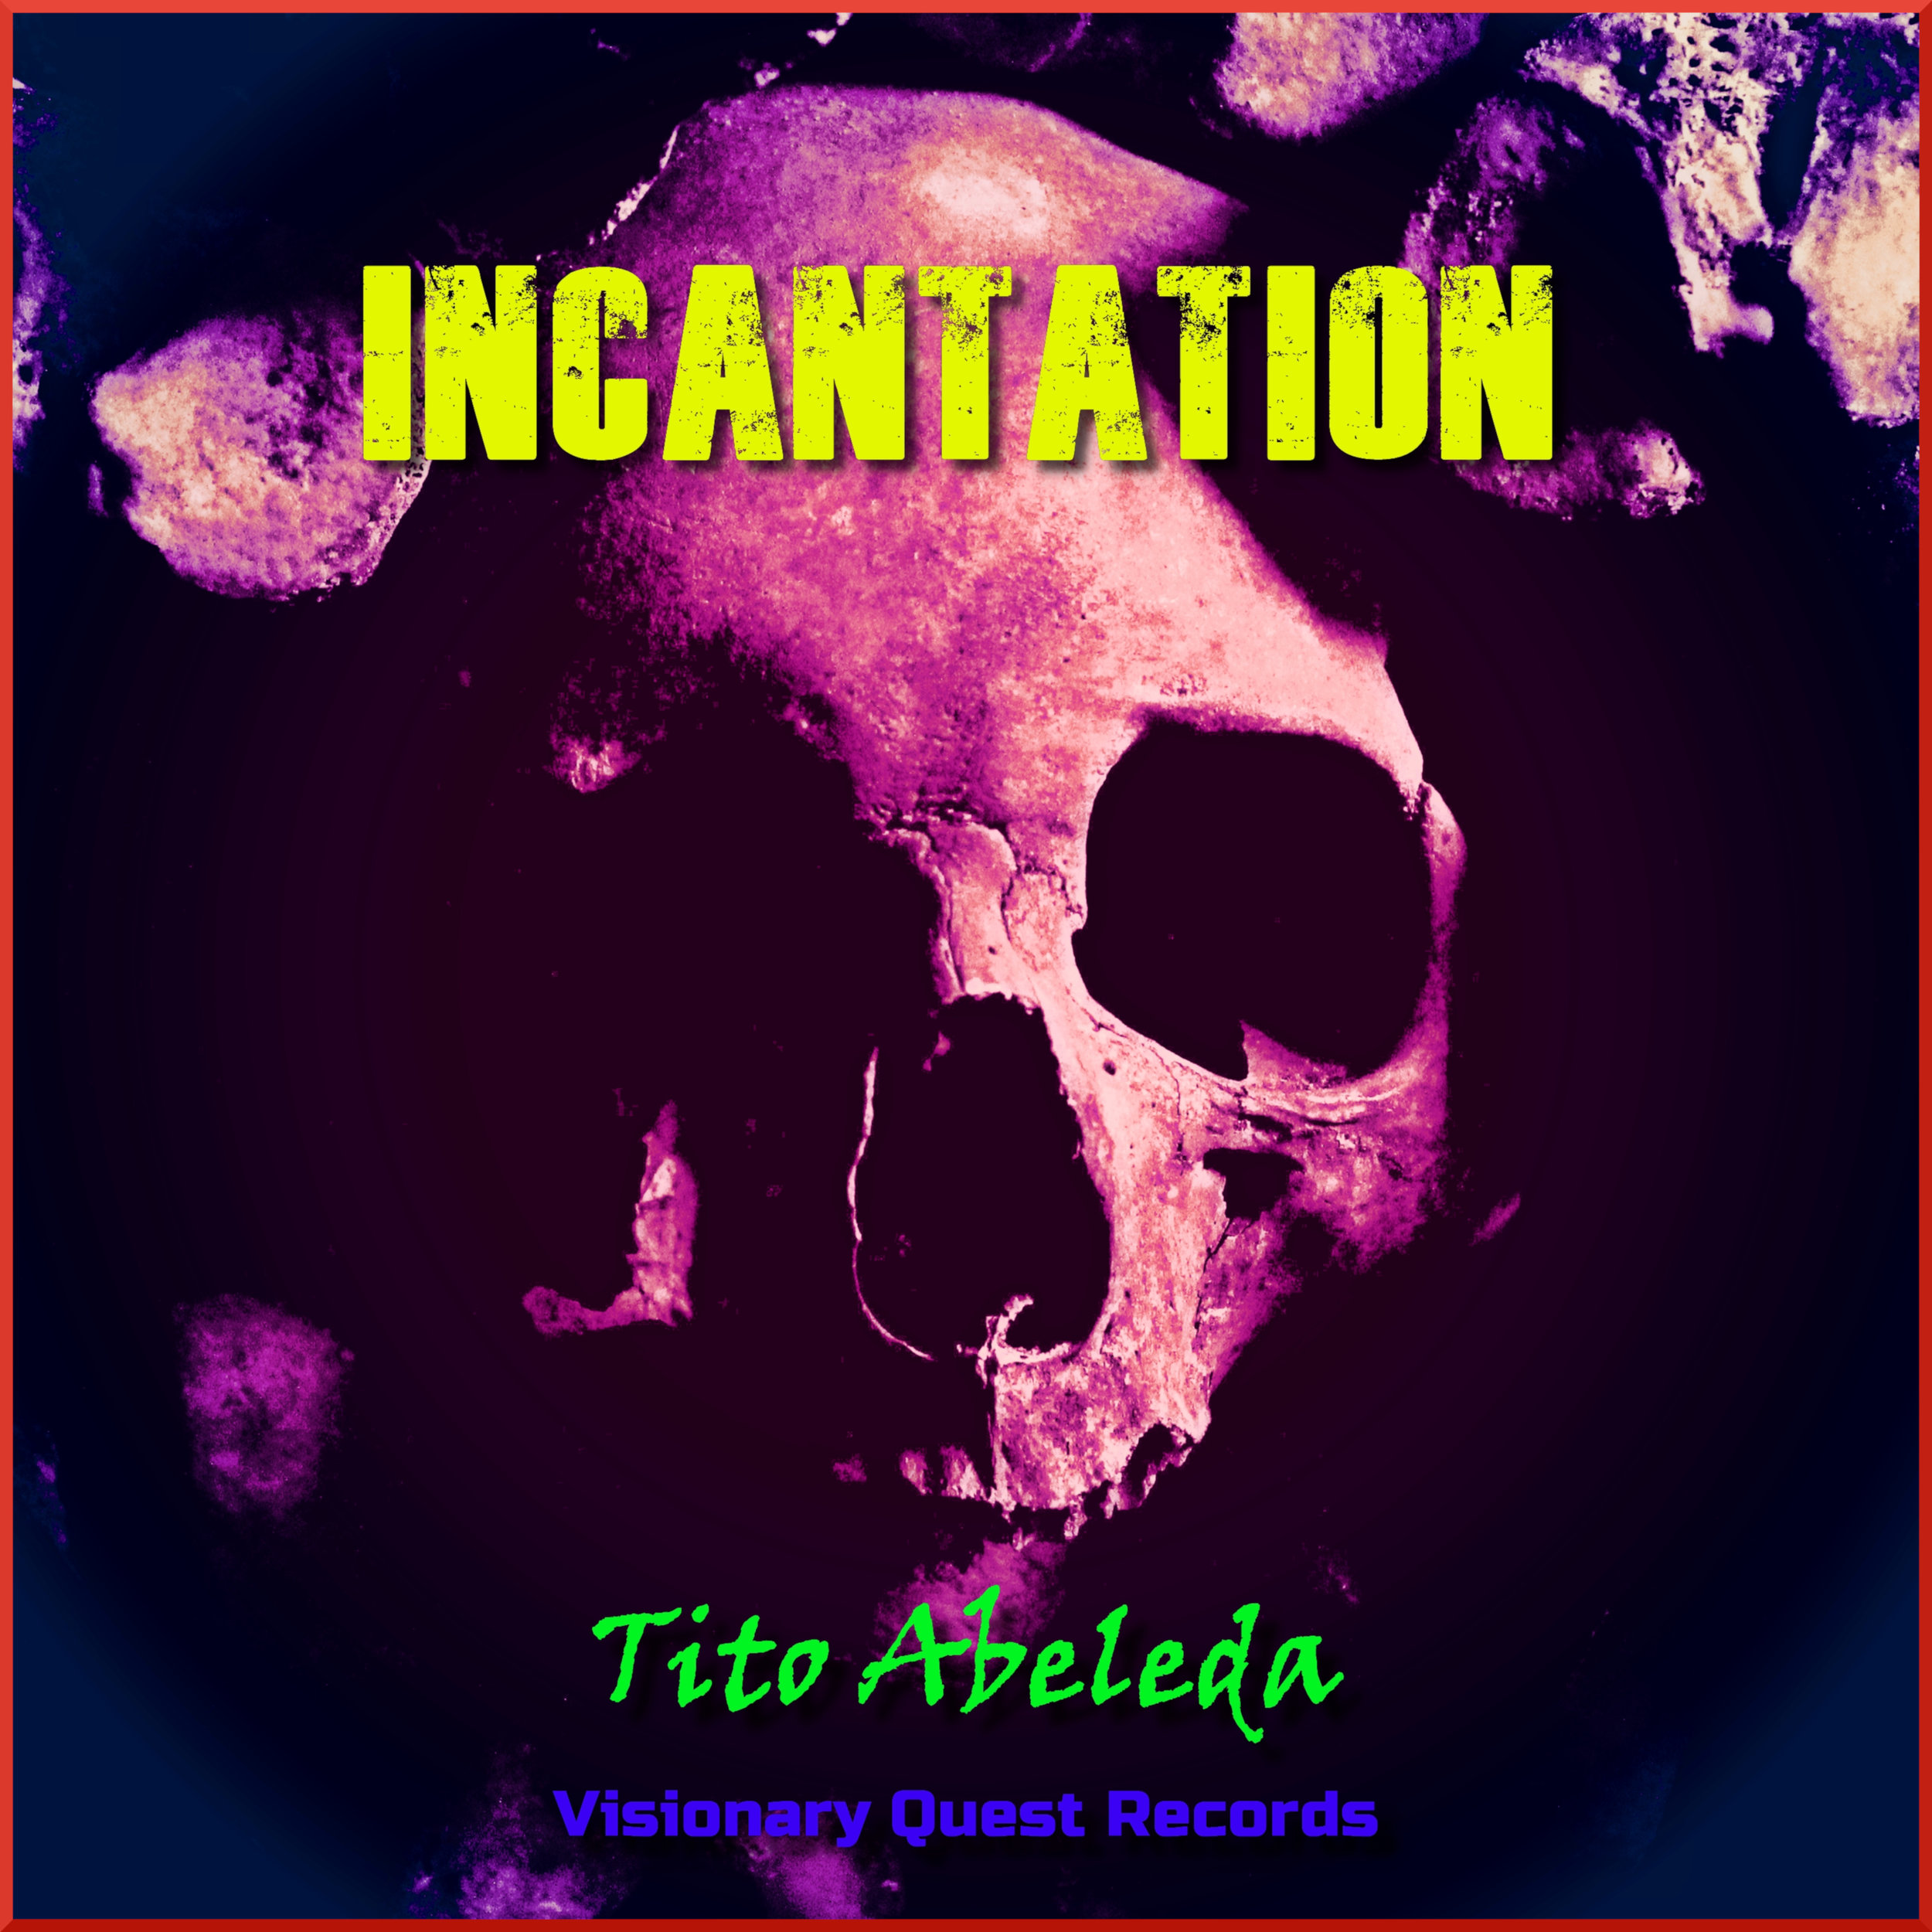 Incantation-Album-Cover-3000x3000.jpg